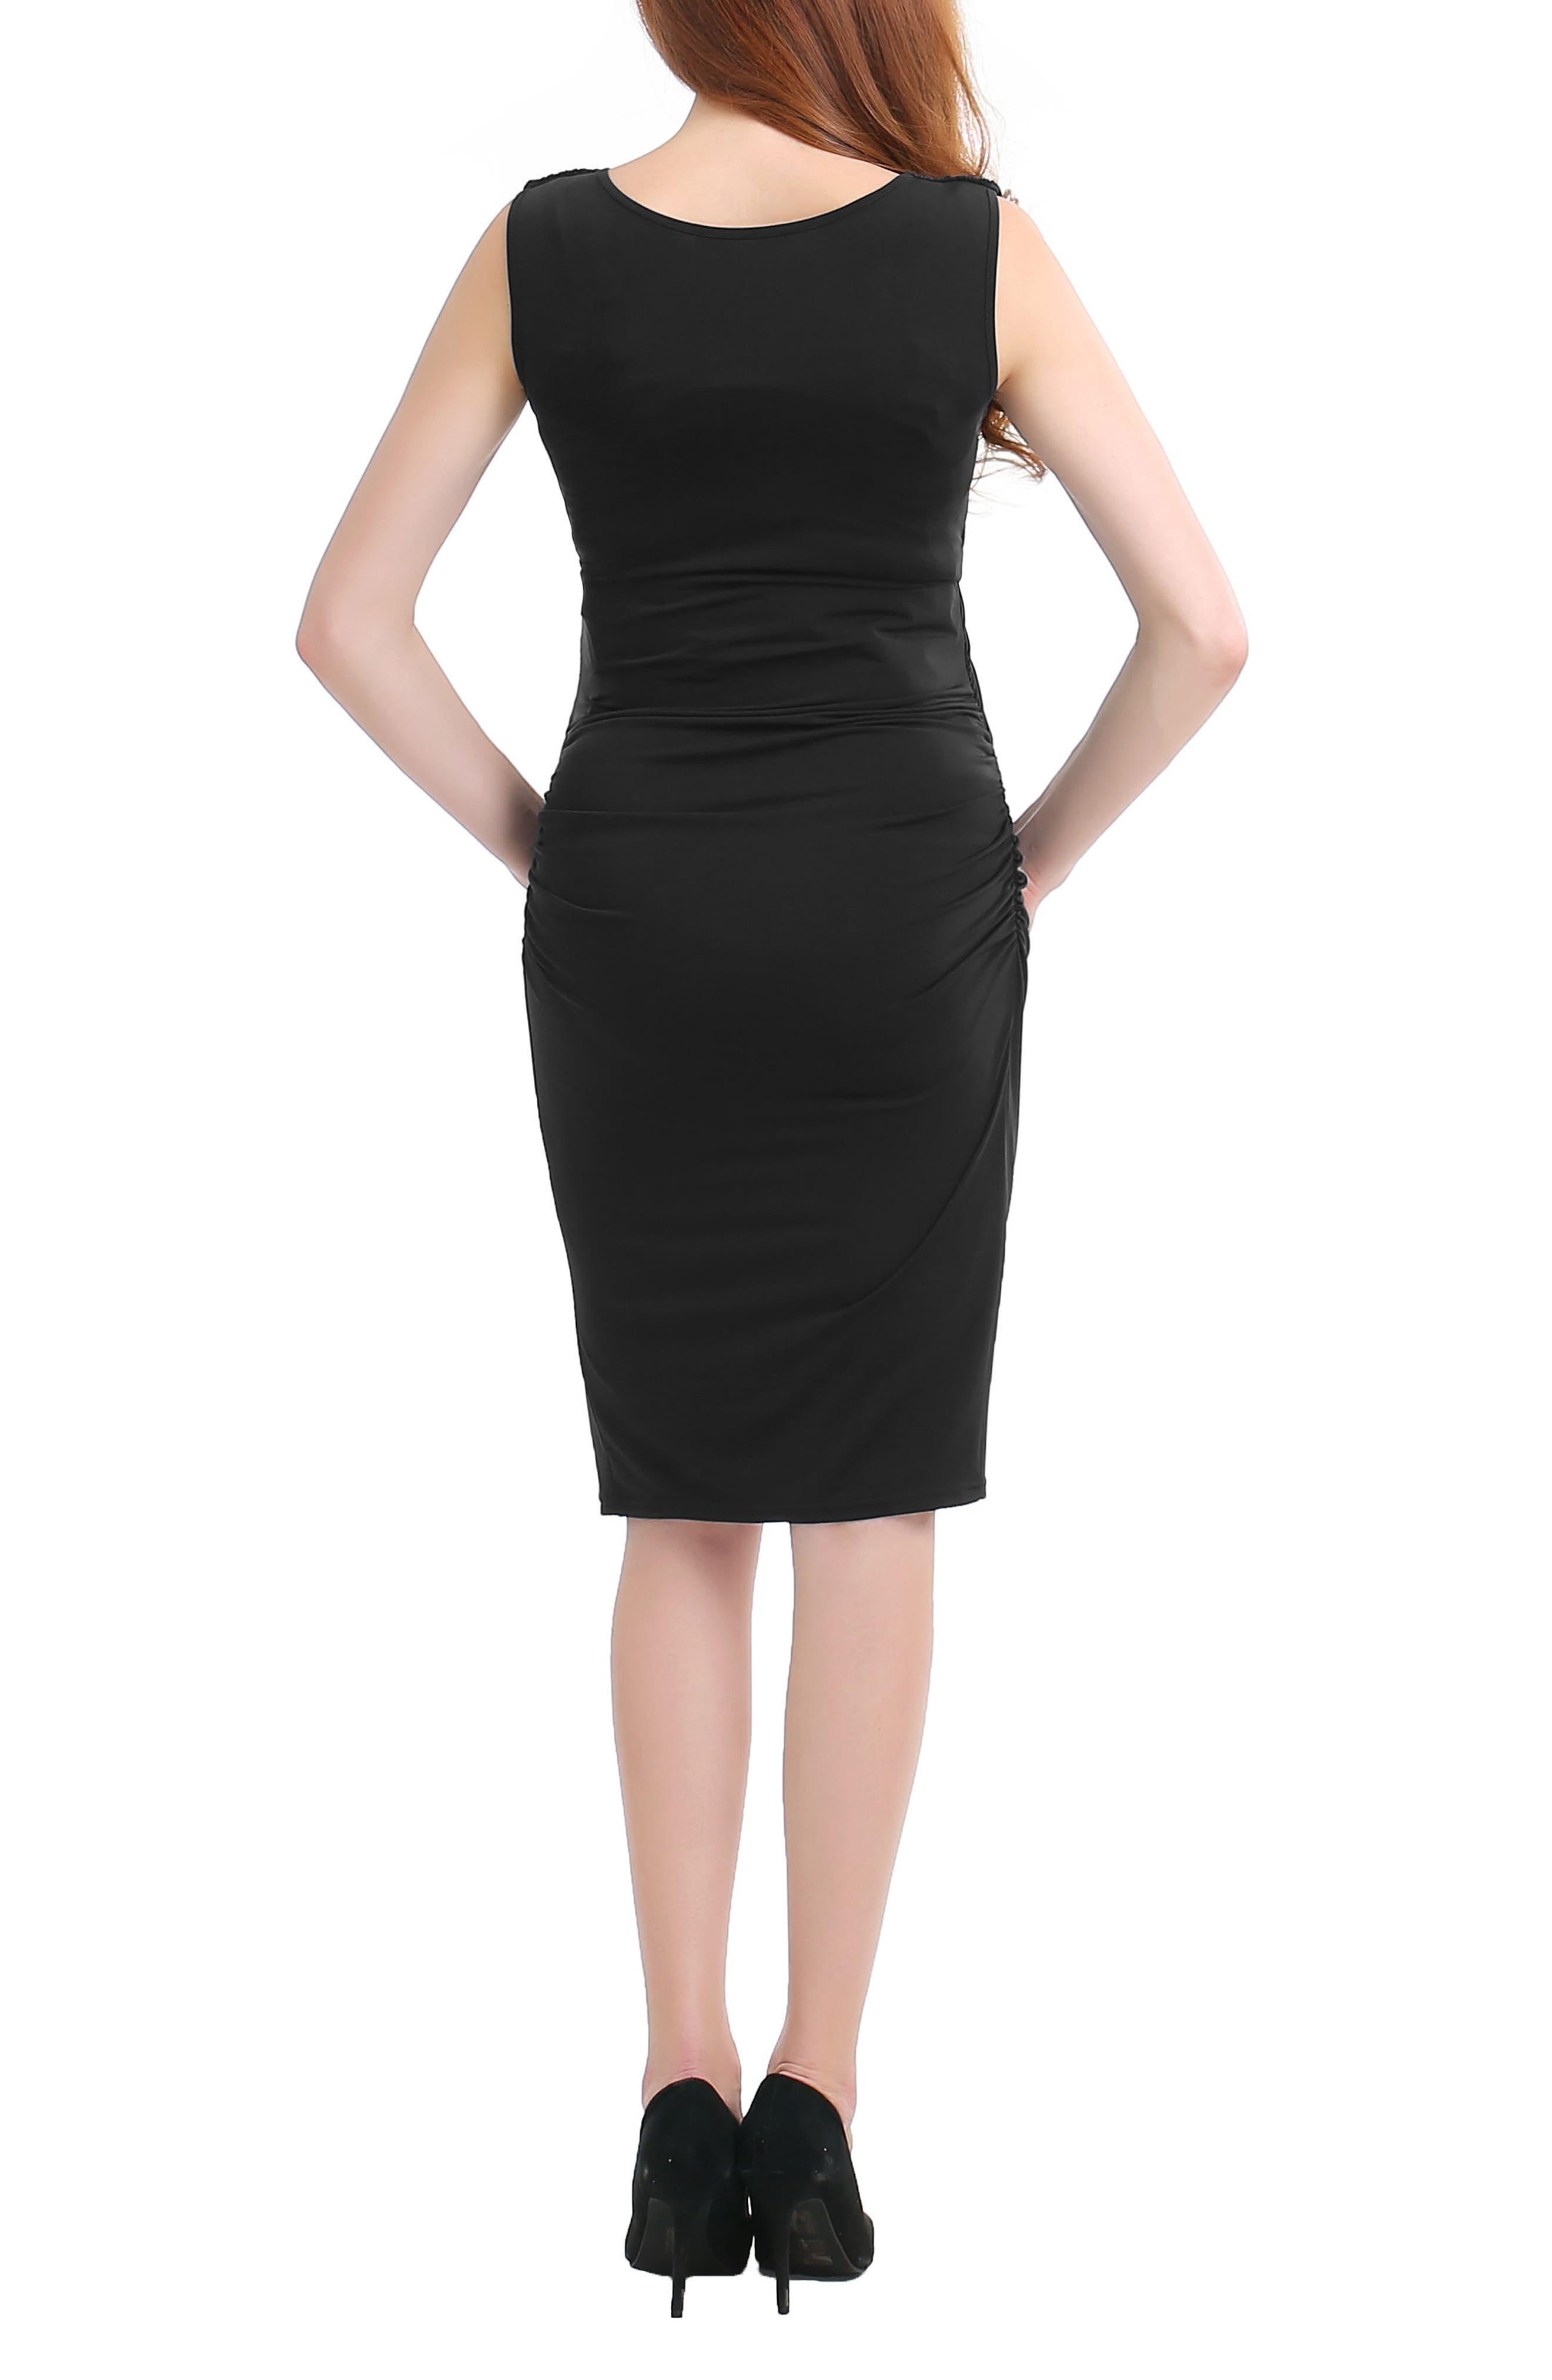 Bonnie Wrap Maternity Dress,                             Alternate thumbnail 3, color,